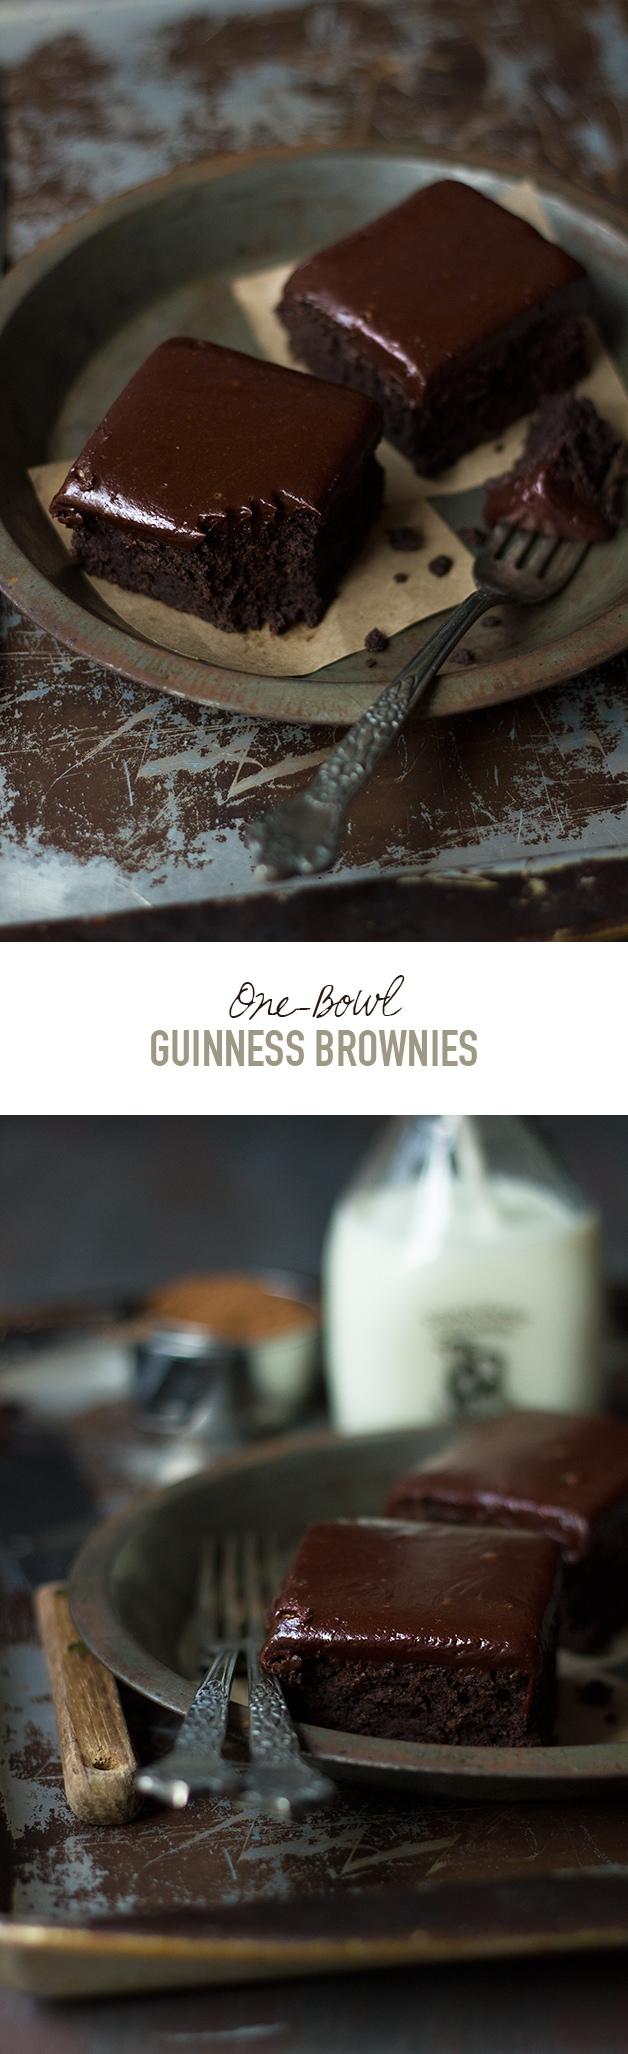 One-Bowl Guinness Brownies | www.brighteyedbaker.com